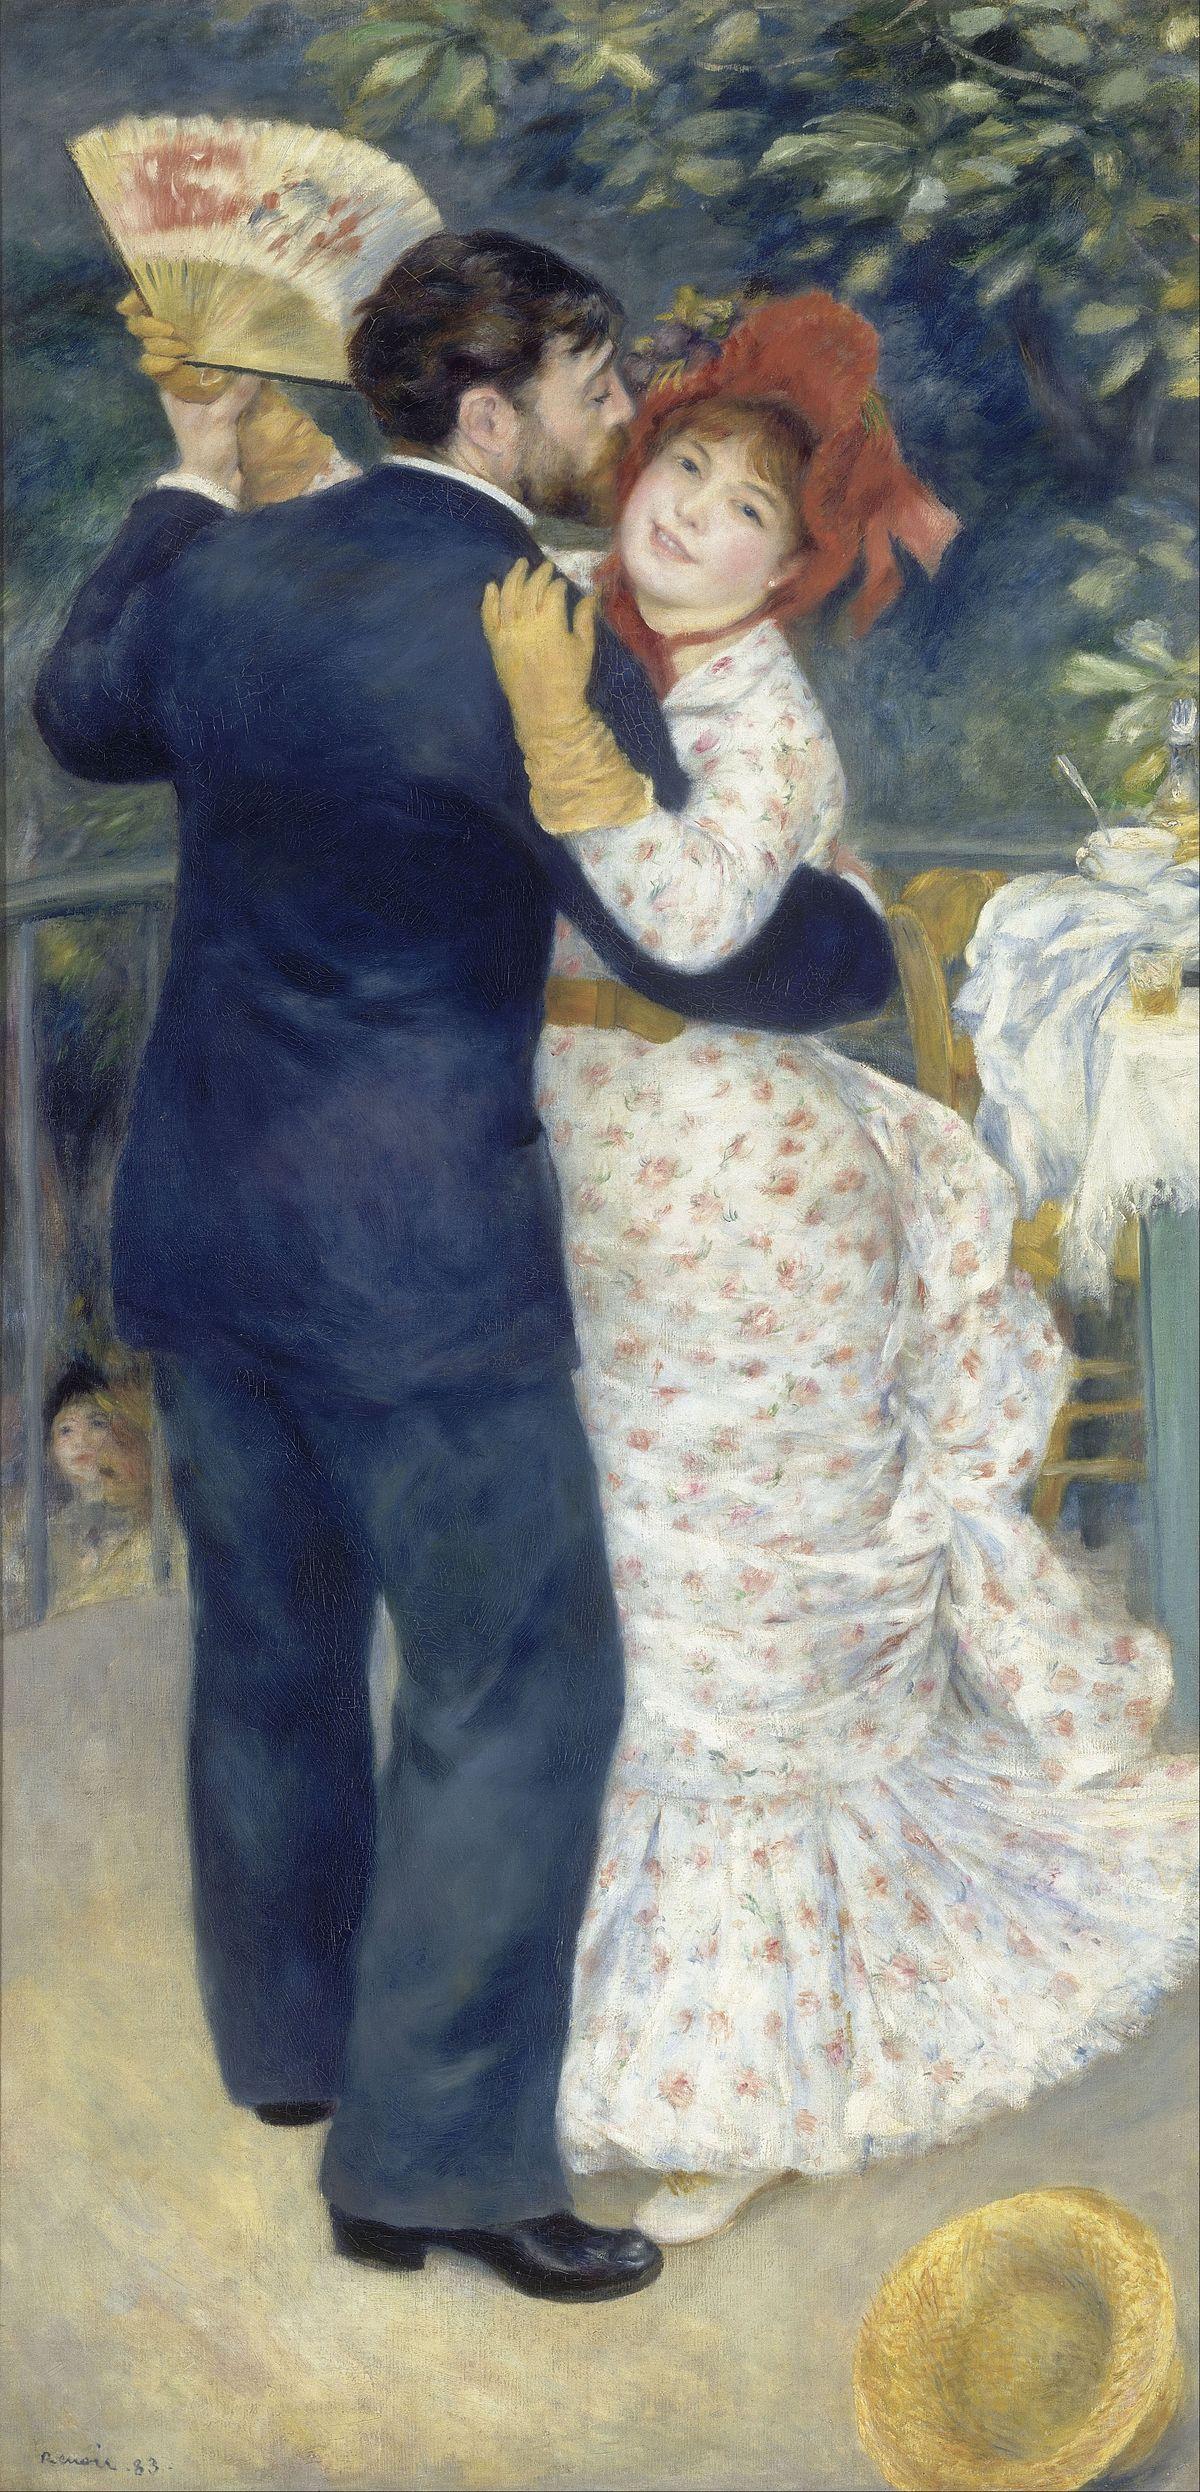 Pierre Auguste Renoir - Country Dance - Google Art Project.jpg